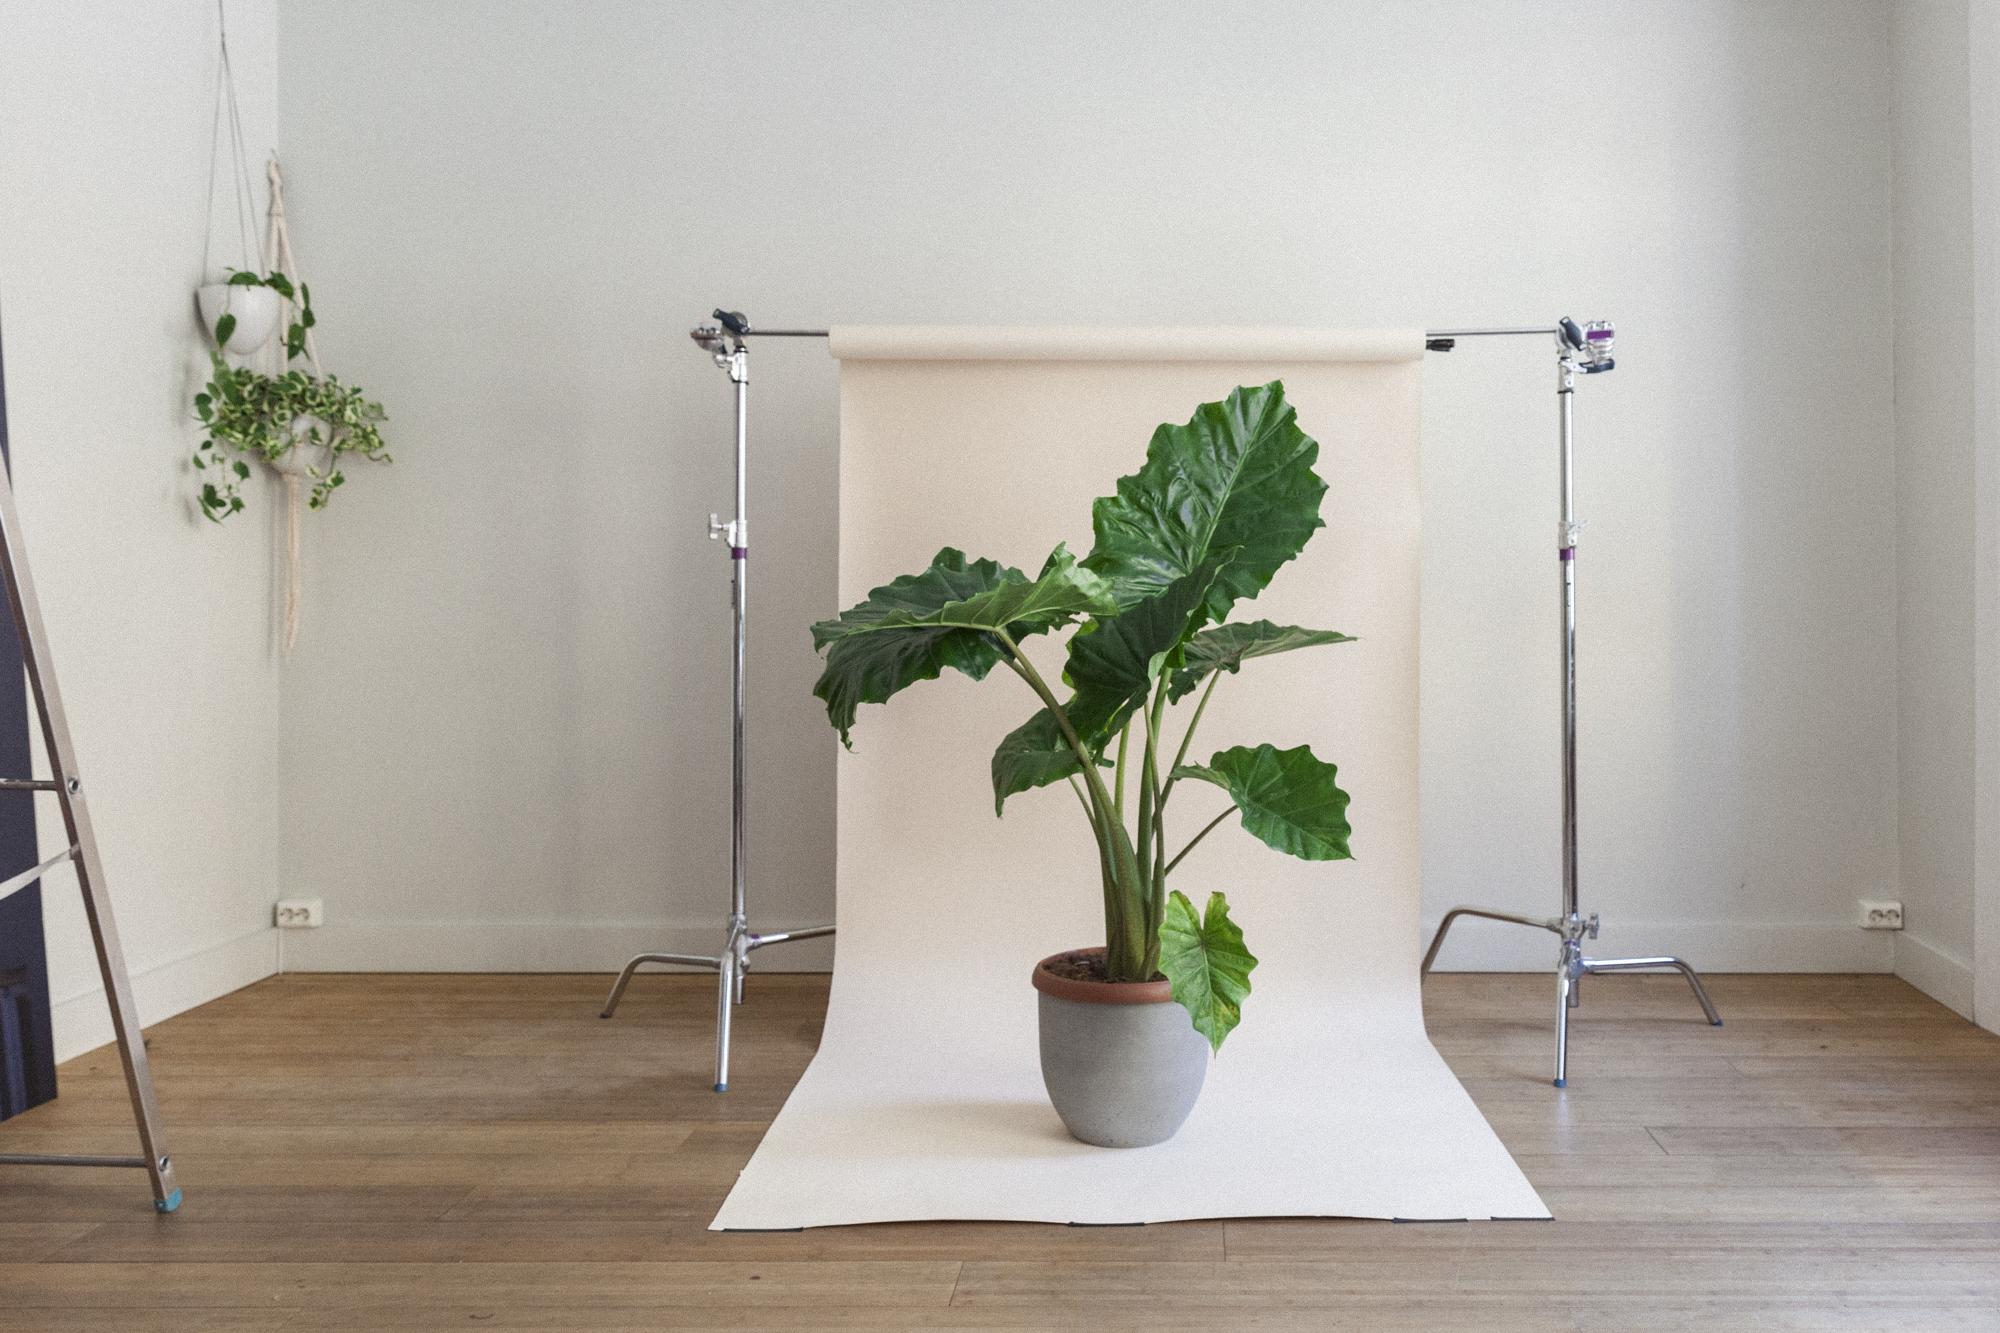 alocasia portodora planteportrett gromagasinet